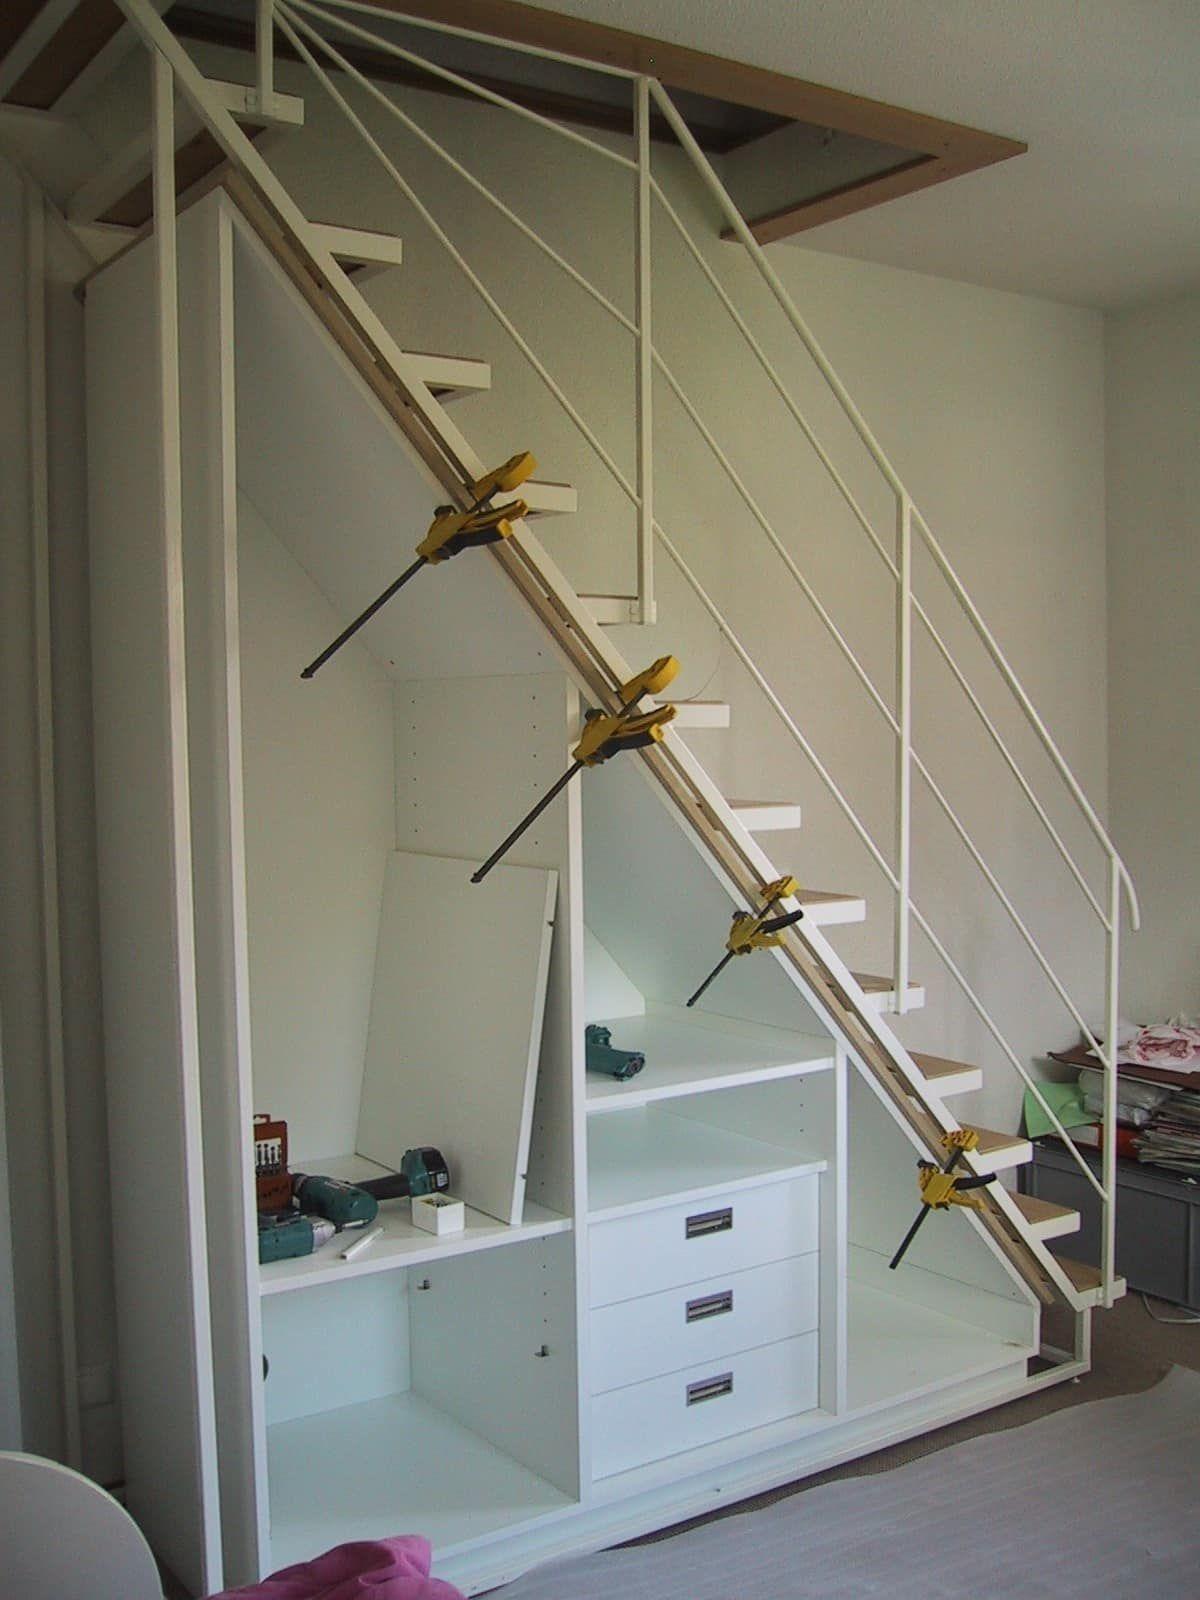 DIY Schrank unter Treppe   Schrank unter treppe, Einbauschrank treppe, Treppe